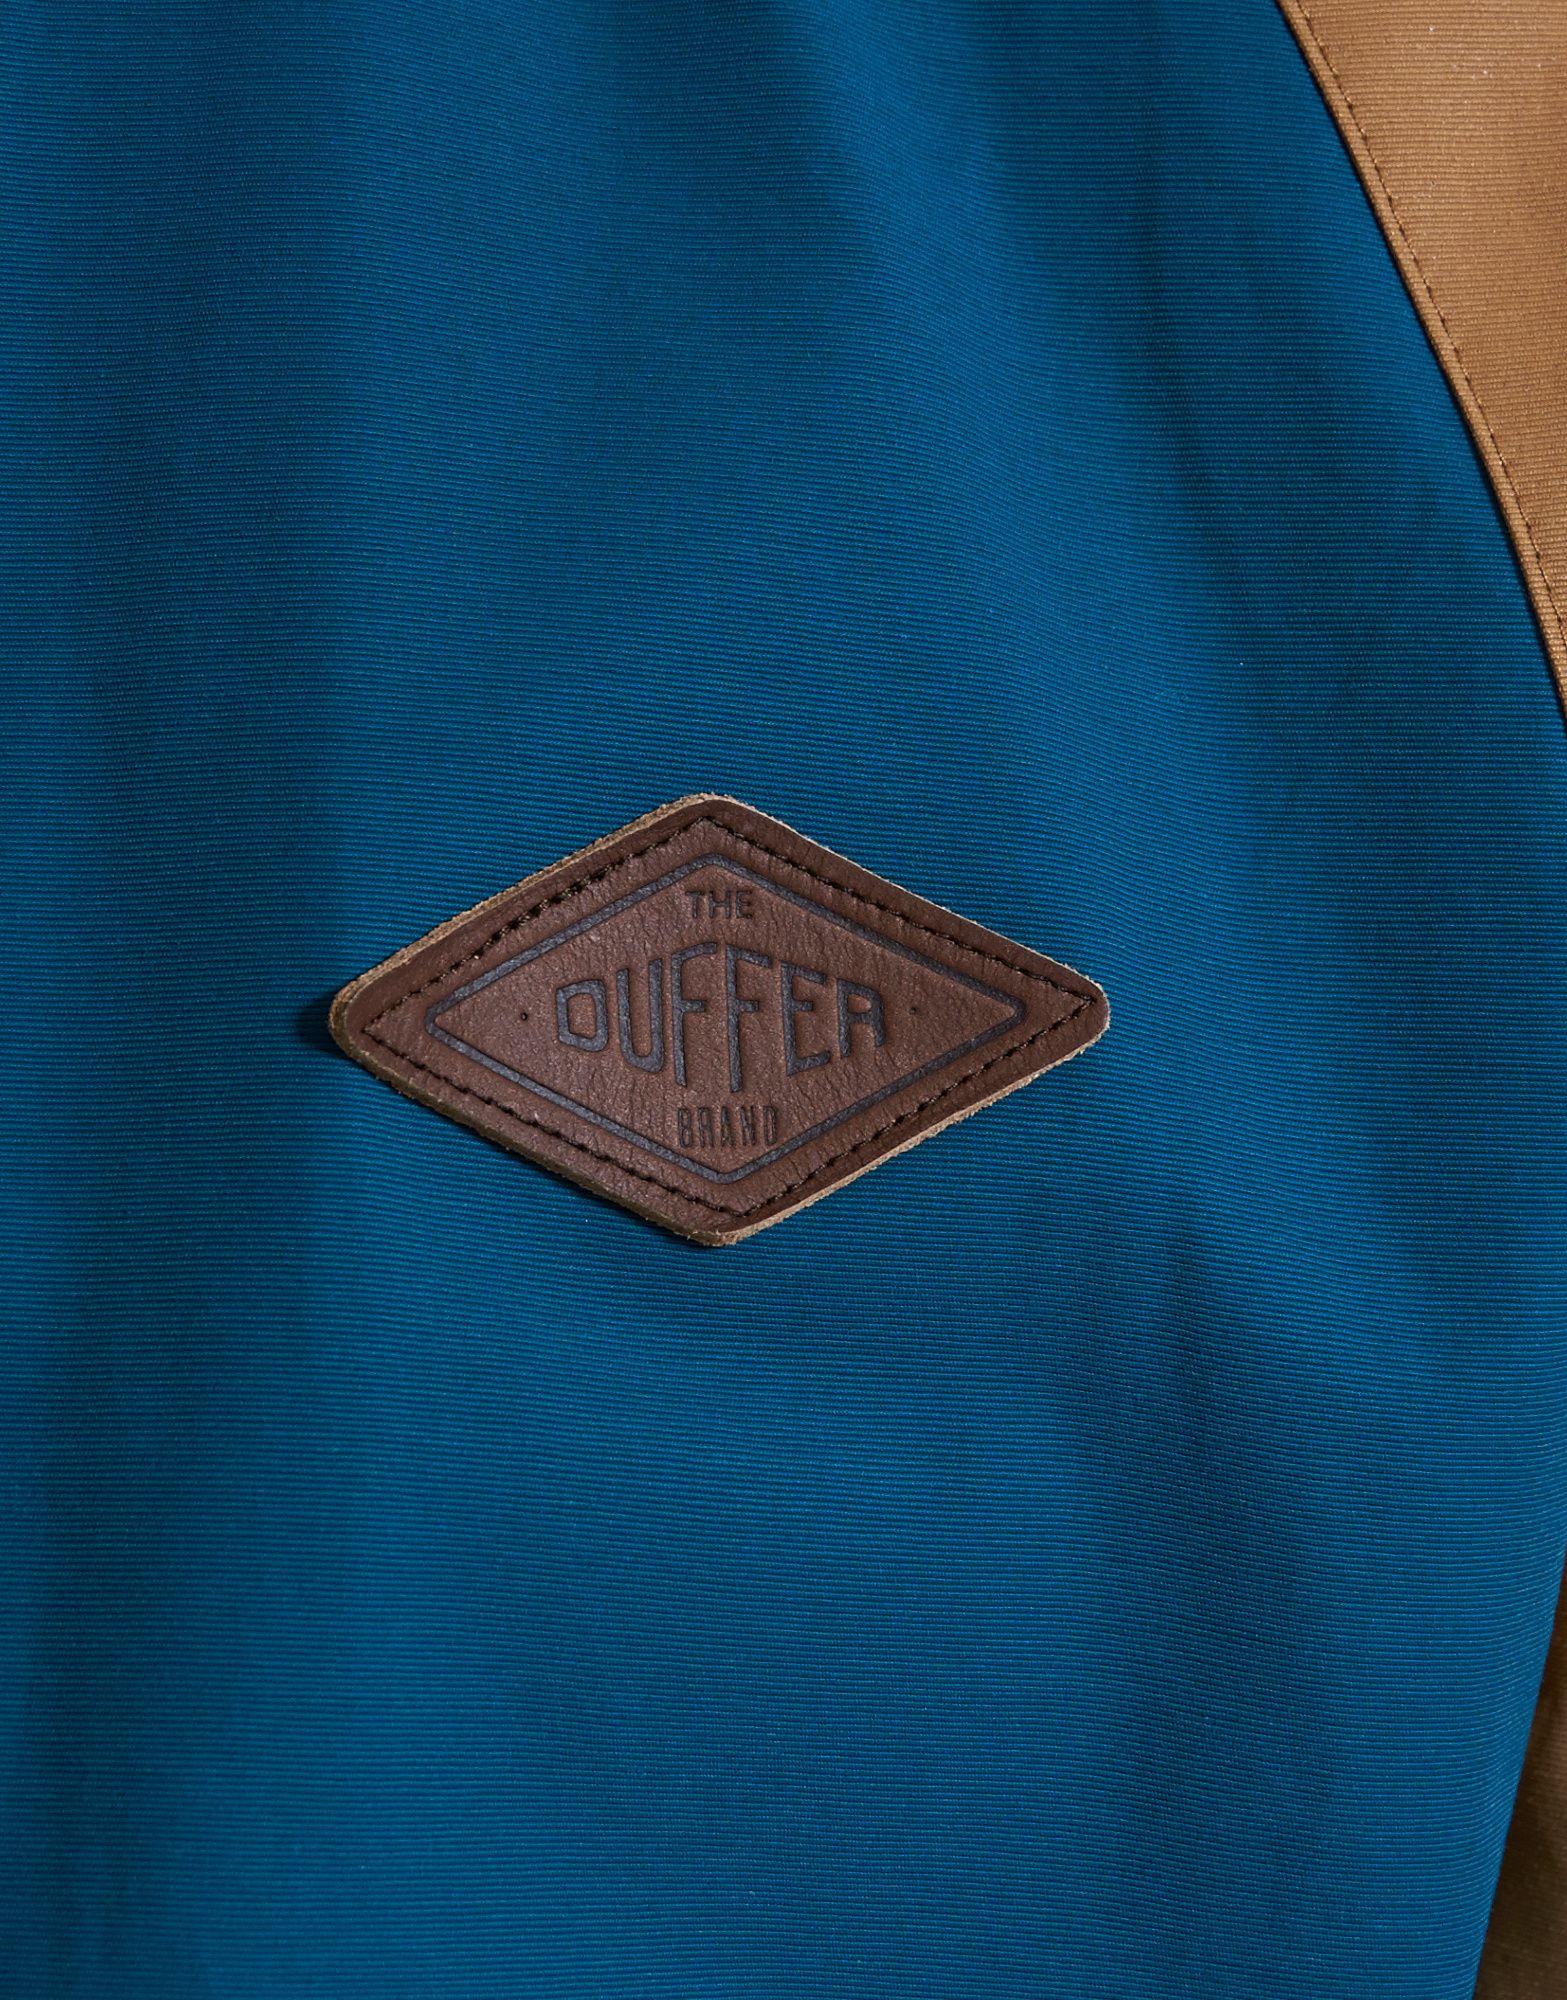 Duffer of St George Monty Jacket